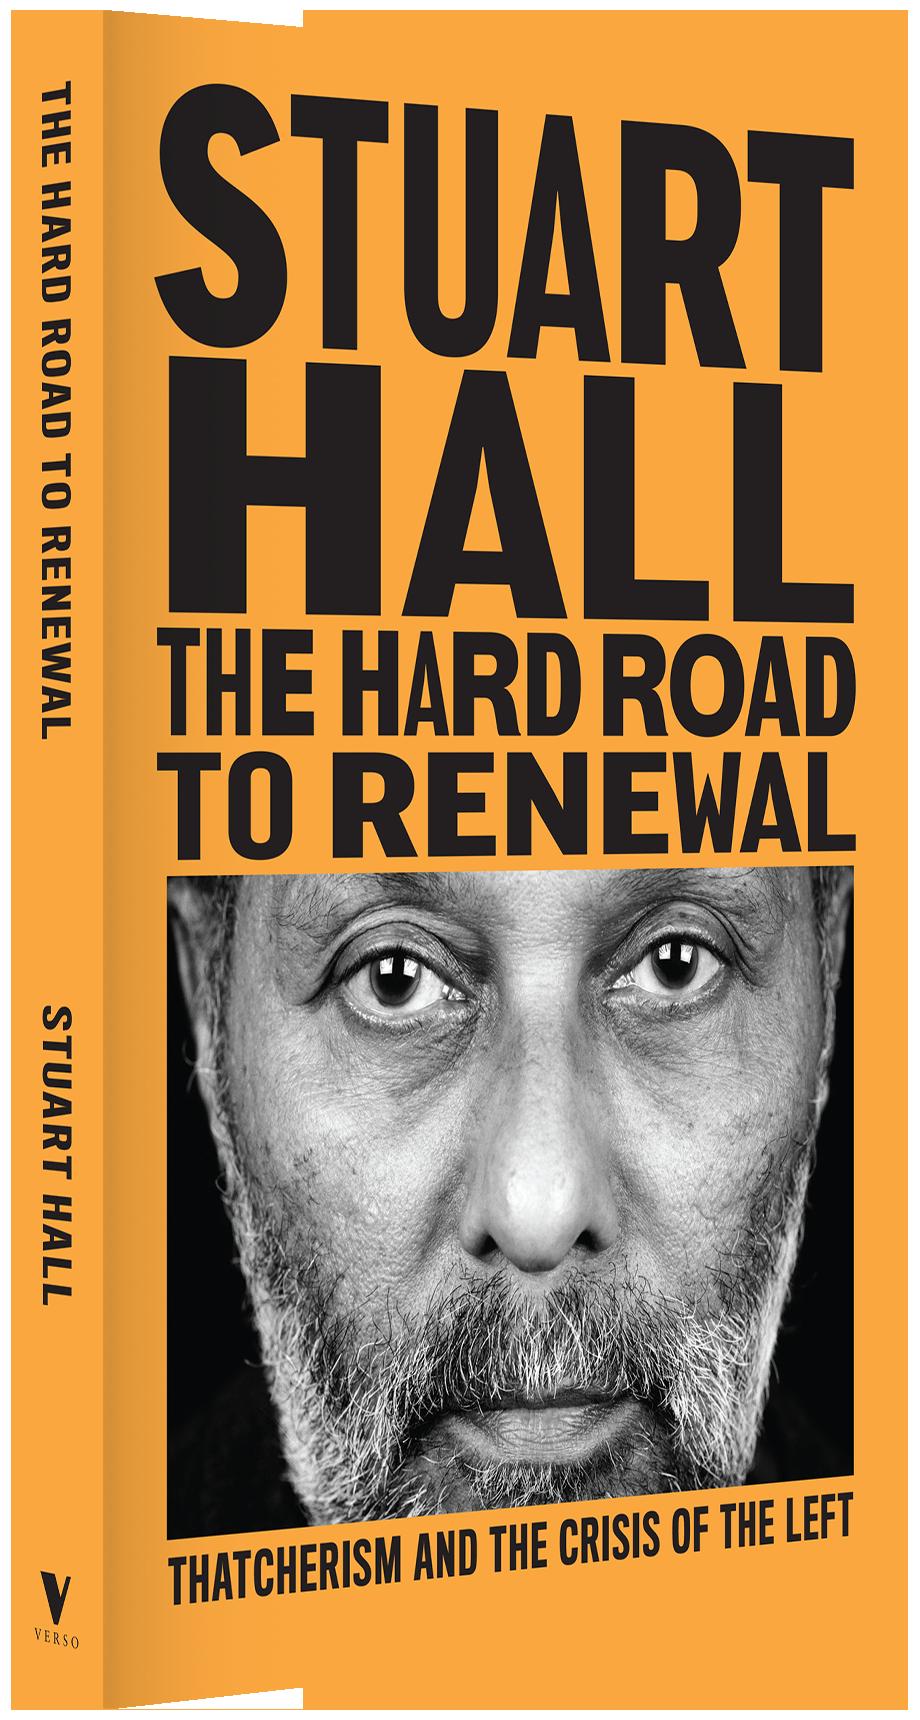 Hard-road-to-renewal